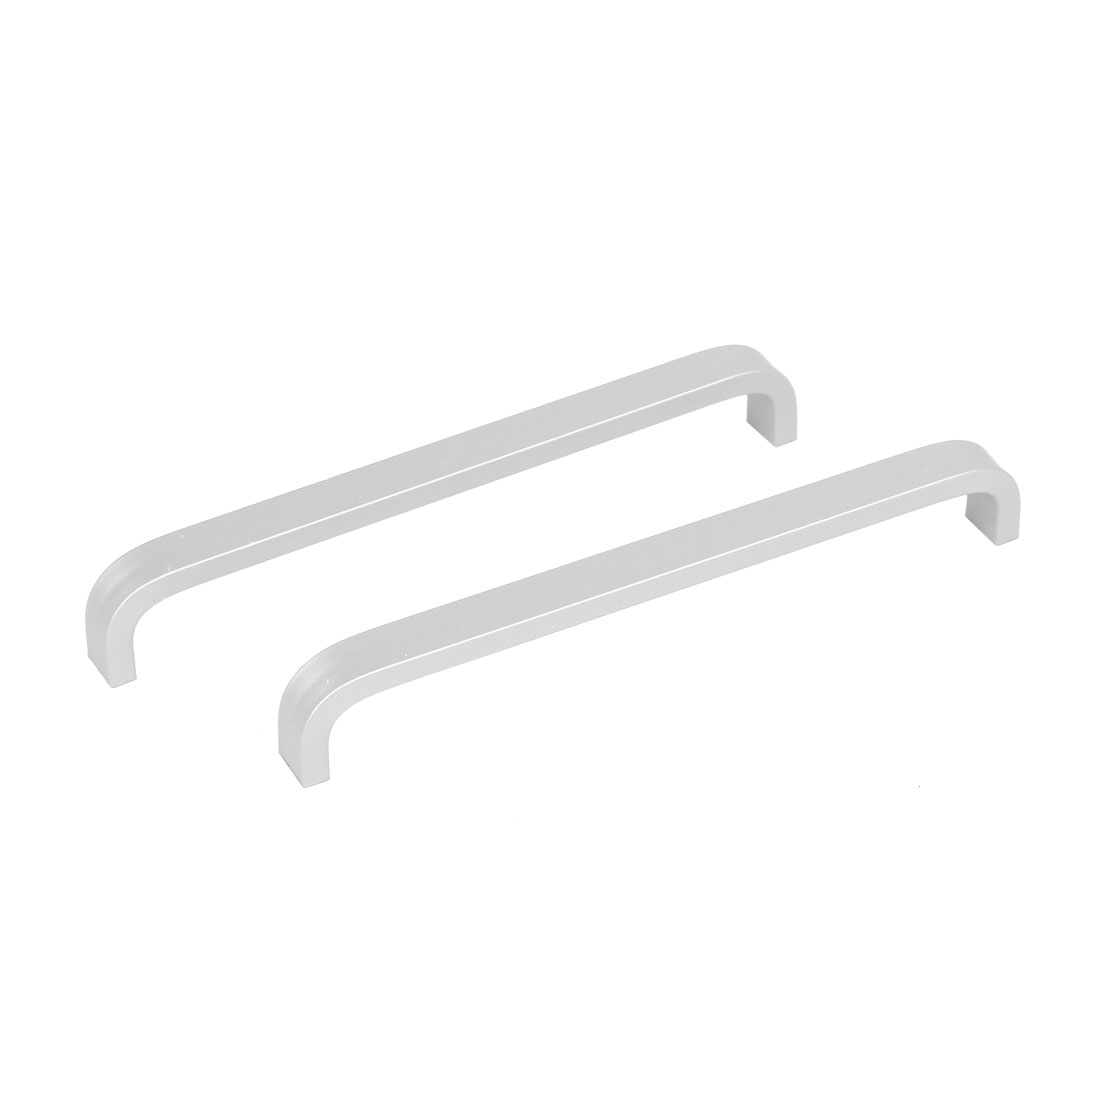 Closet Drawer Aluminum Flat Bow Type Pull Handle Silver Tone 133mm Length 2pcs